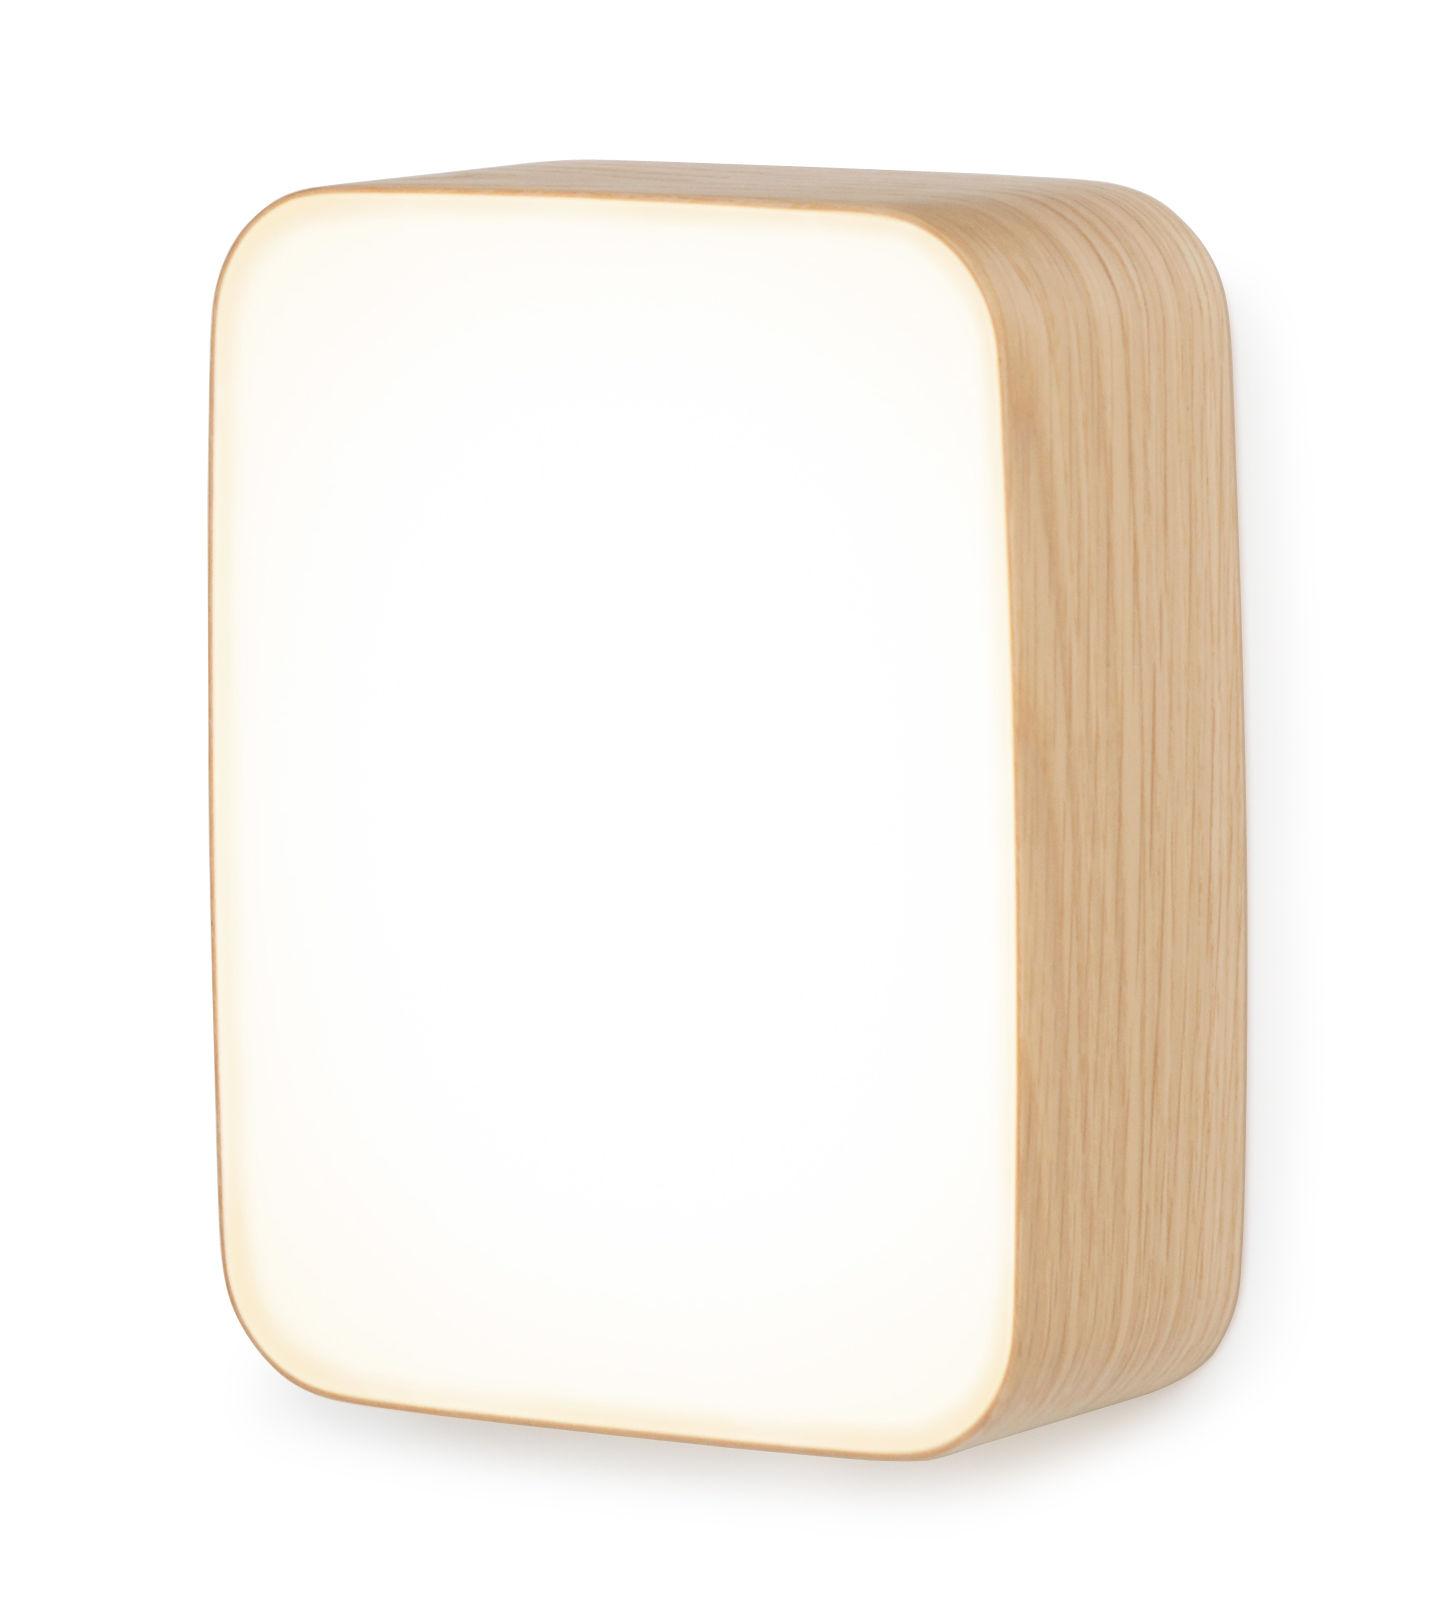 Lighting - Wall Lights - Cube Small Wall light by Tunto - 16 x 22 cm / Oak - Polypropylene